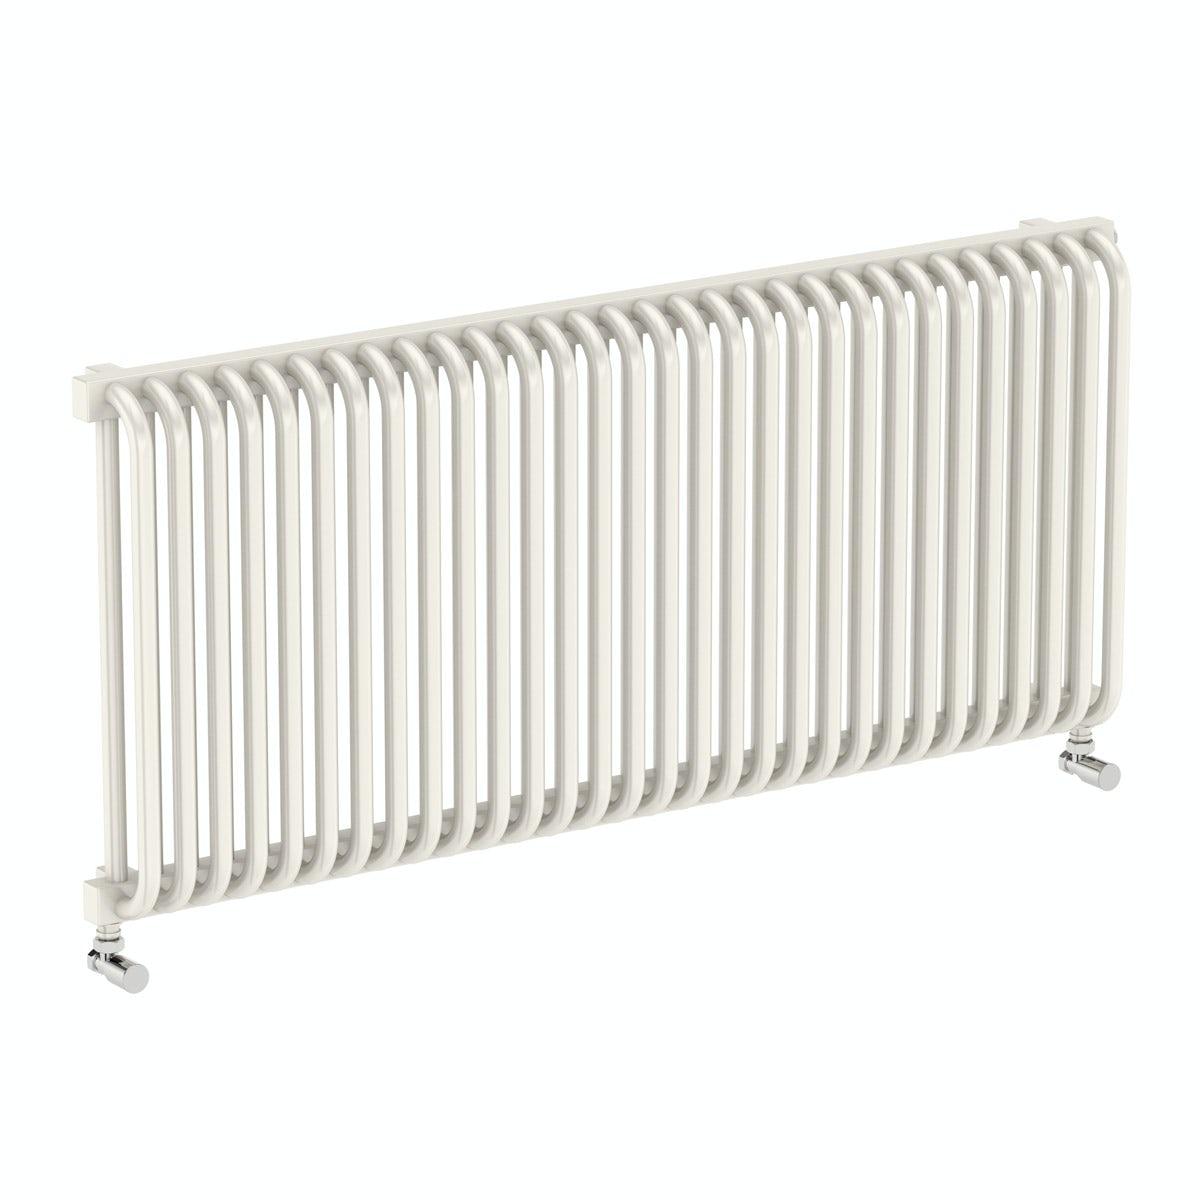 Terma Delfin soft white horizontal radiator 540 x 1220